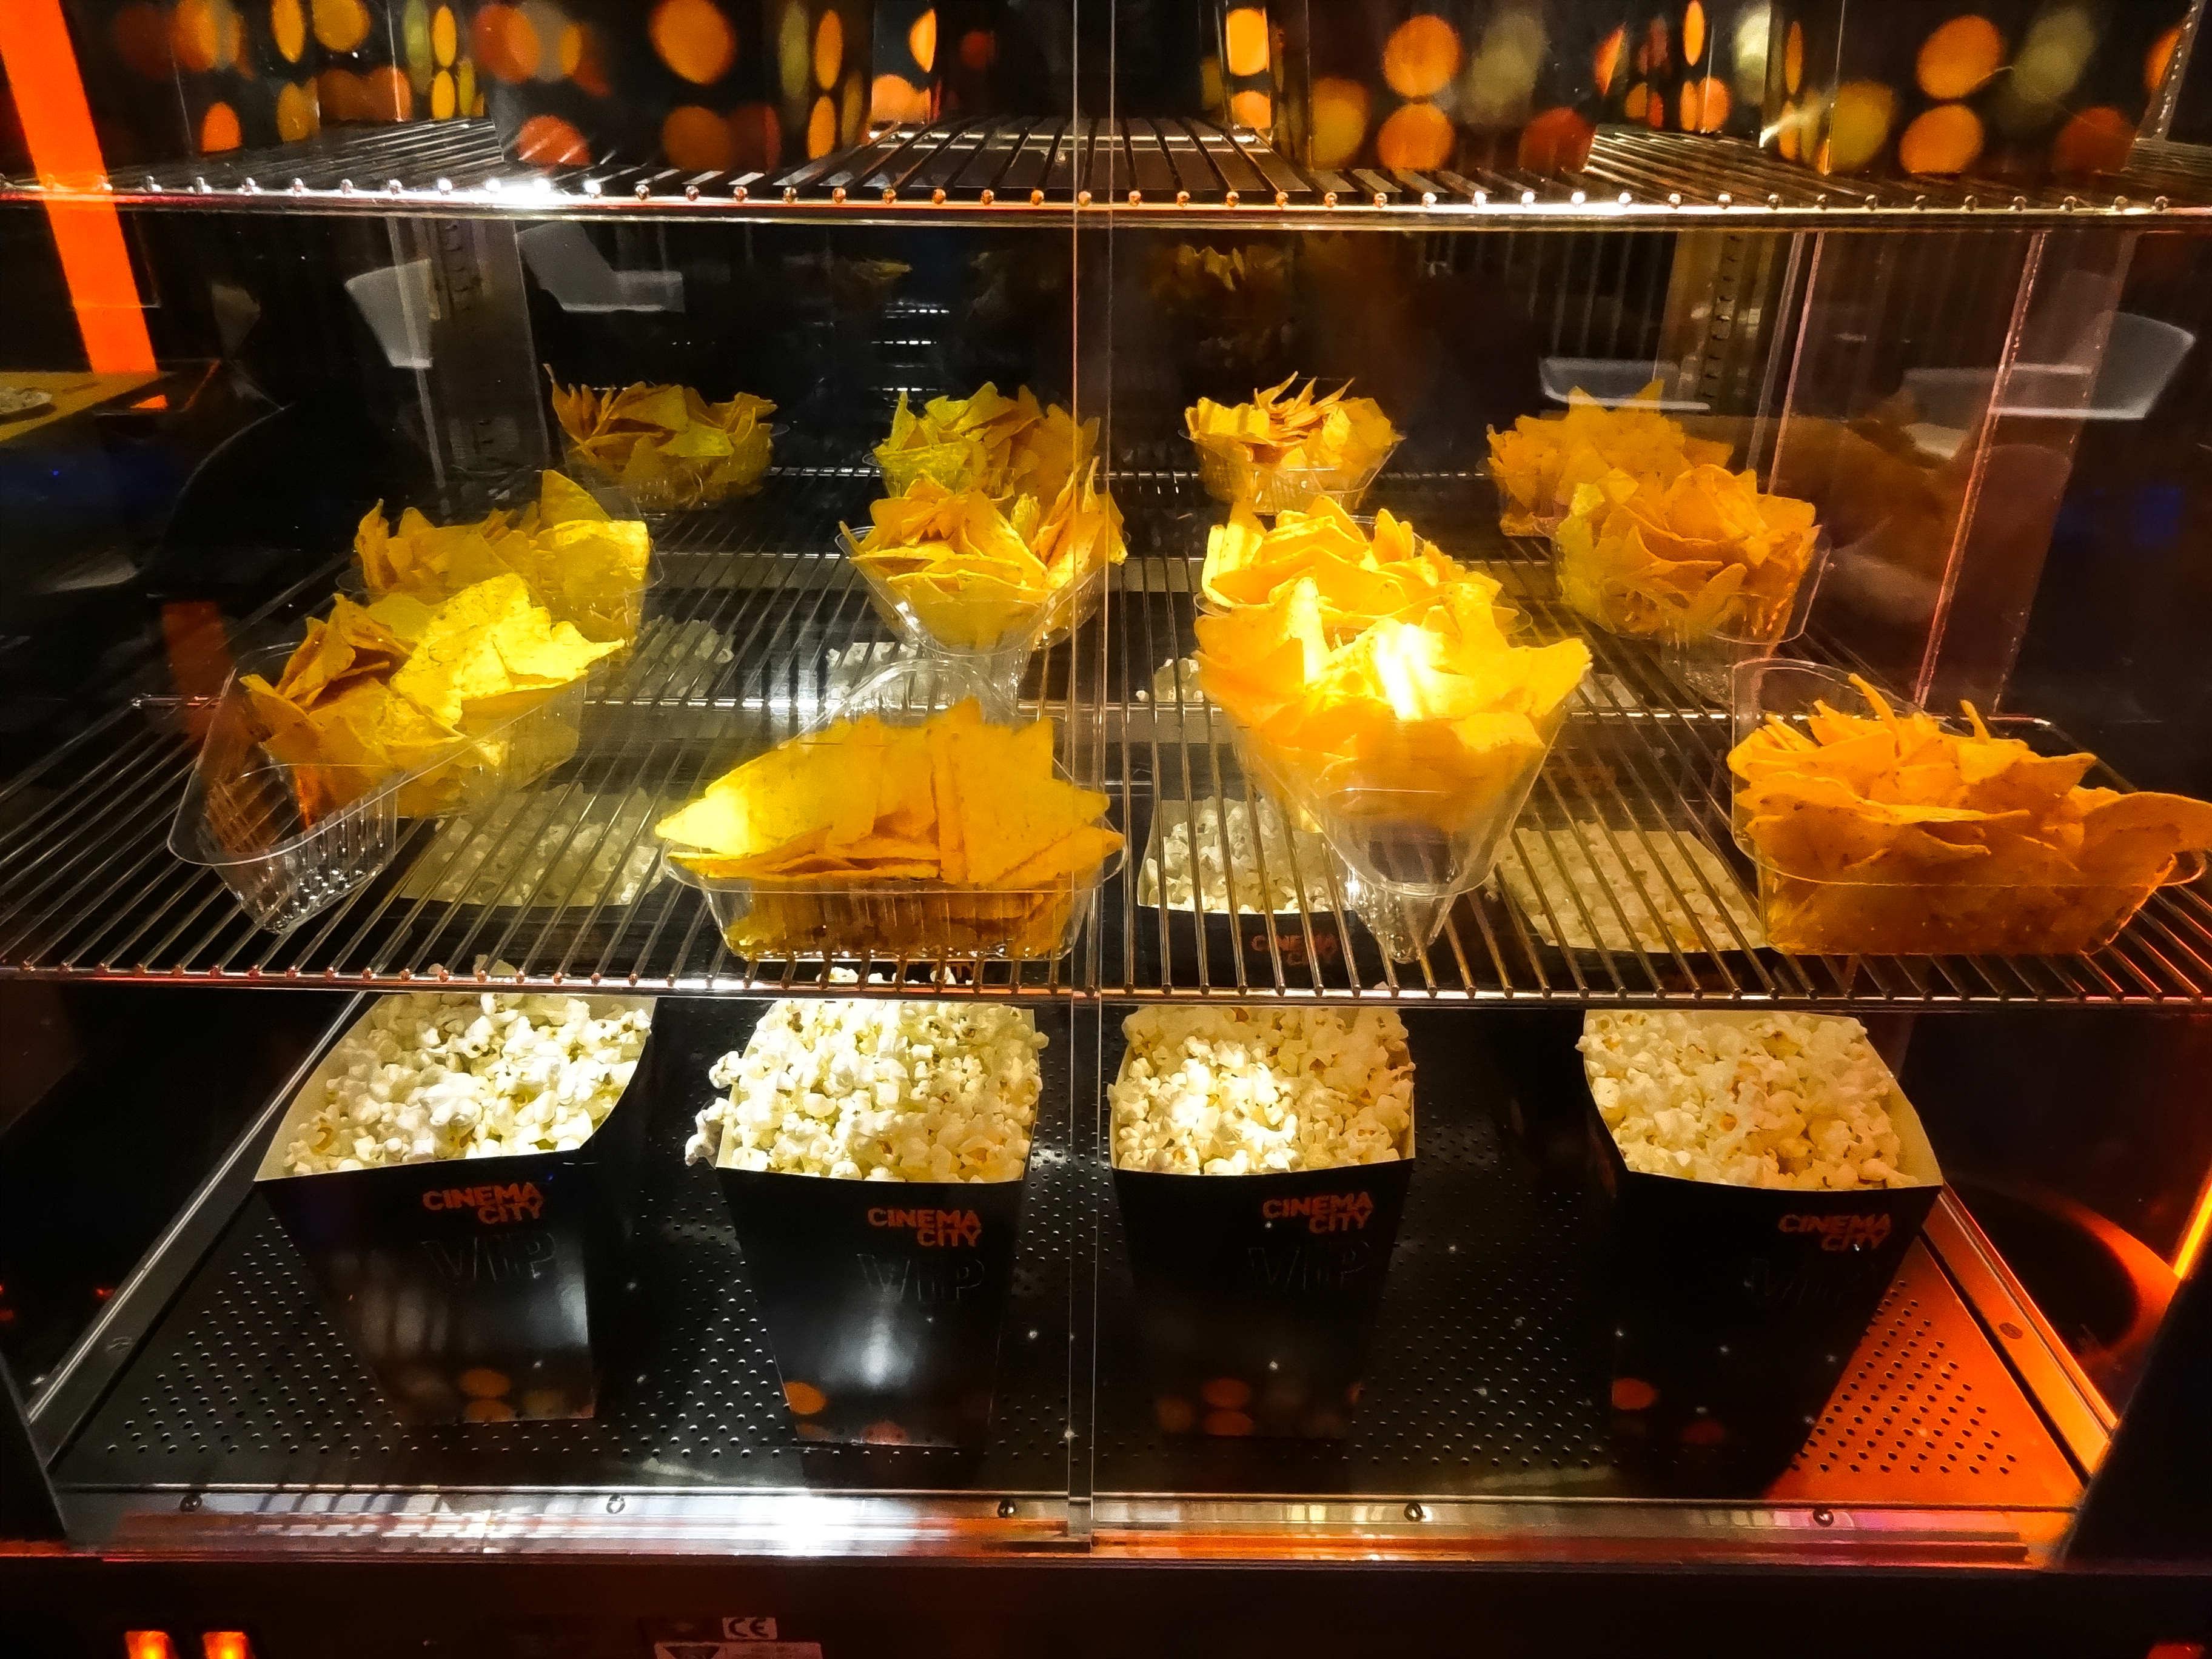 Cinema city vip angellovesdreams kino innego wymiaru relax chill tacos popcorn w kinie